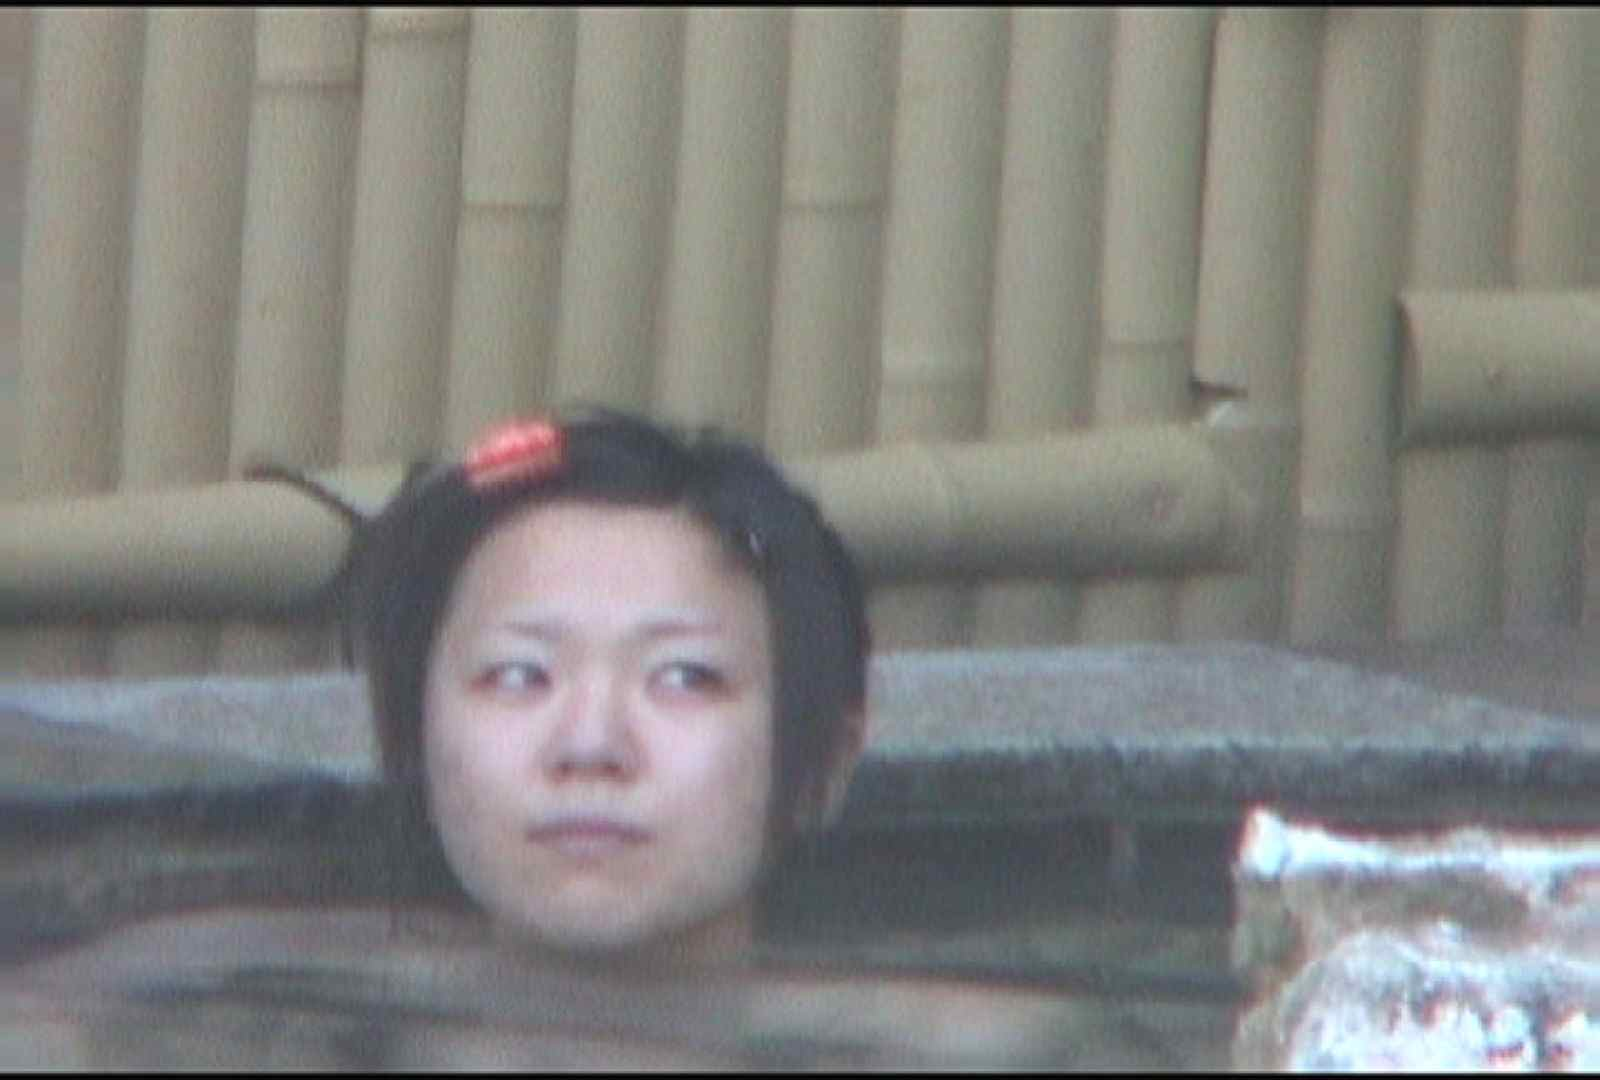 Aquaな露天風呂Vol.175 OLのエロ生活 | 露天風呂  71連発 28